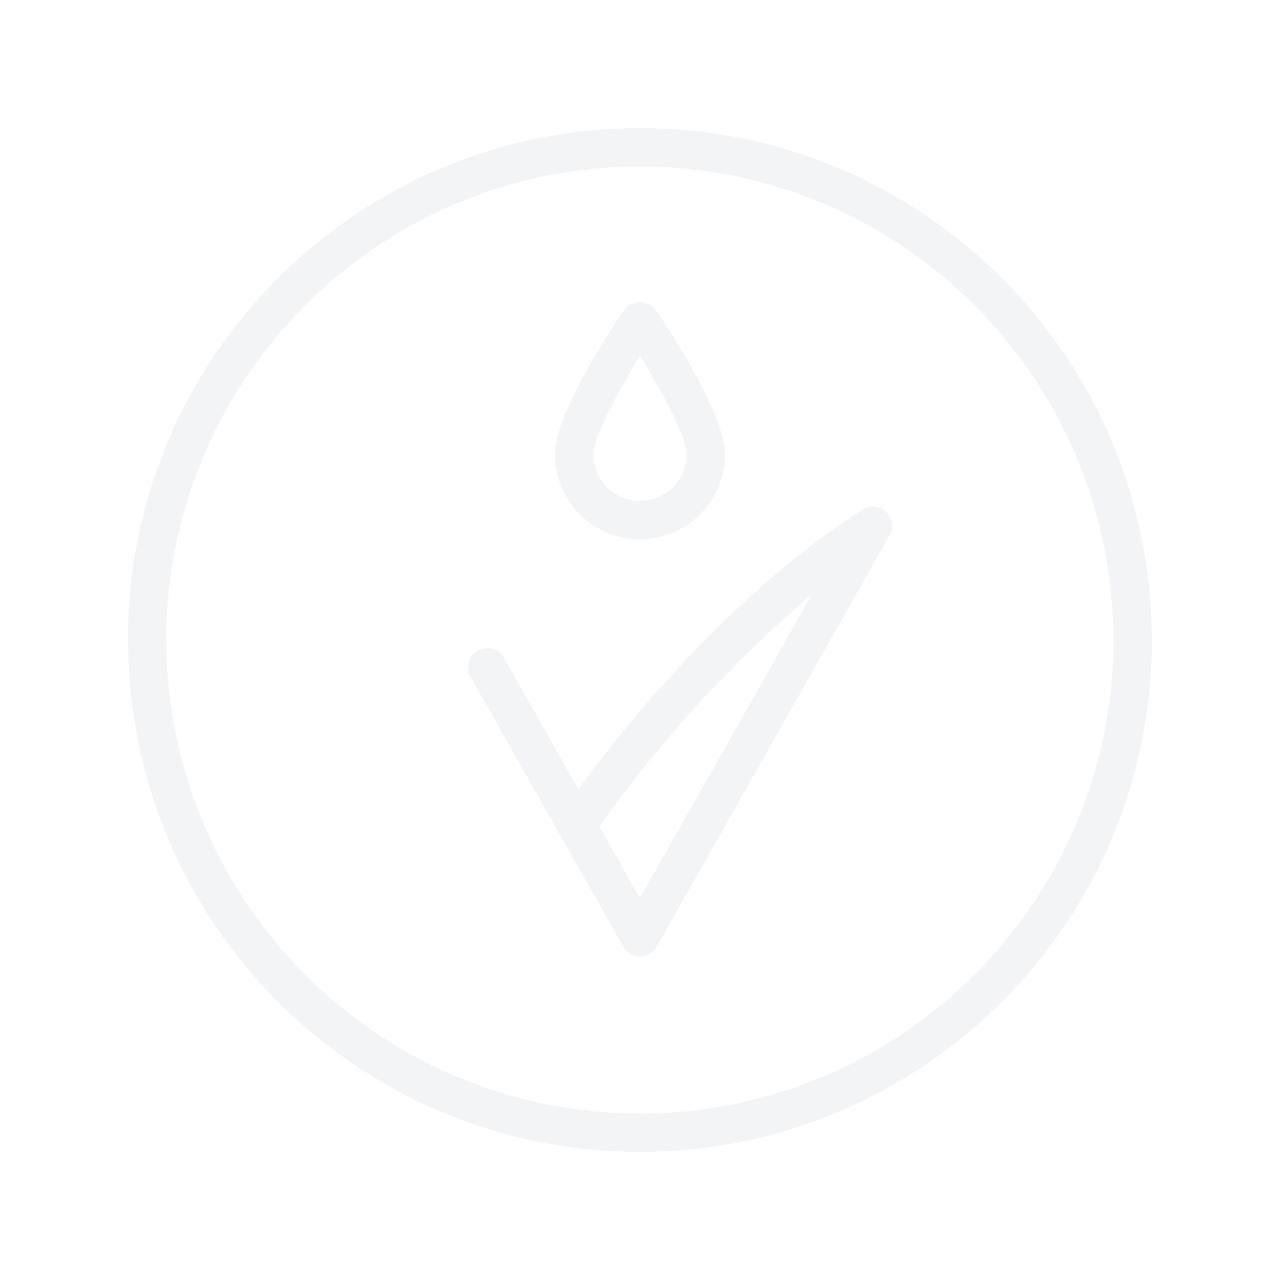 TONYMOLY Master Lab Vitamin C Sheet Mask 1pcs